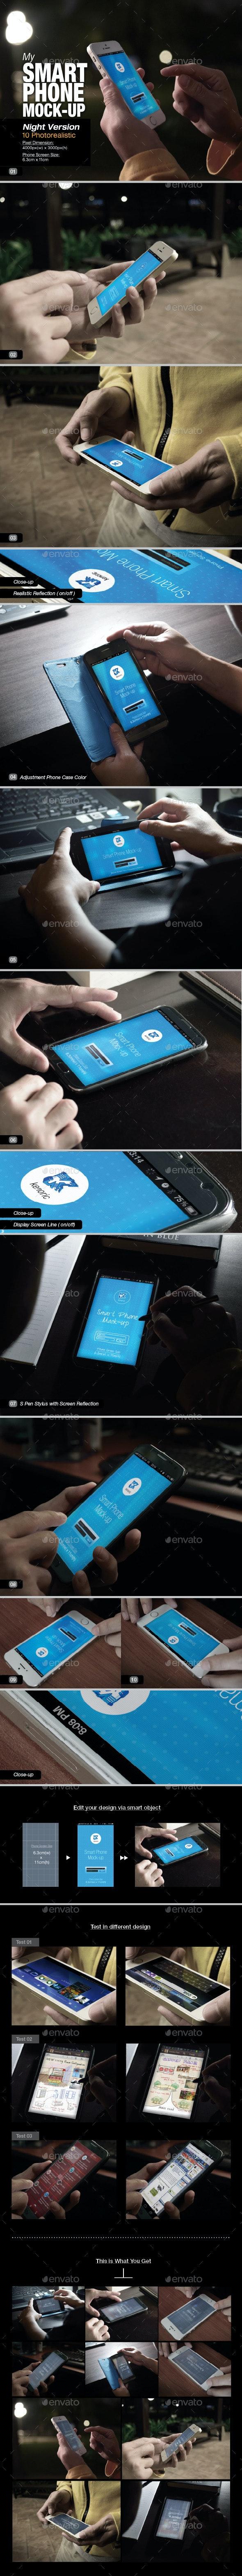 Smart Phone Mock-Up 01 - Mobile Displays